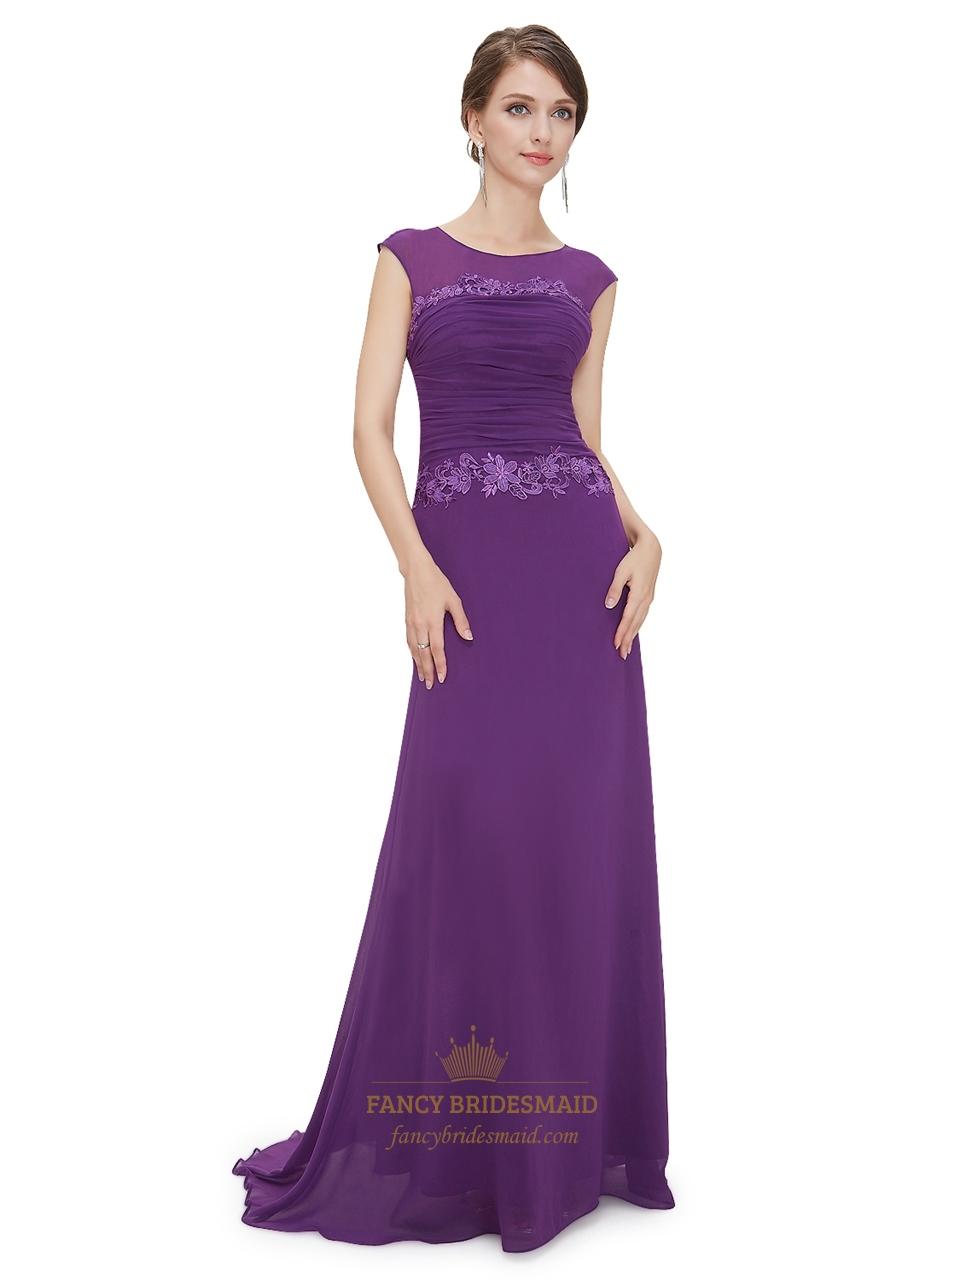 fb0e89067bcb1 Purple Sheath Chiffon Cap Sleeves Prom Dress With Floral Applique ...